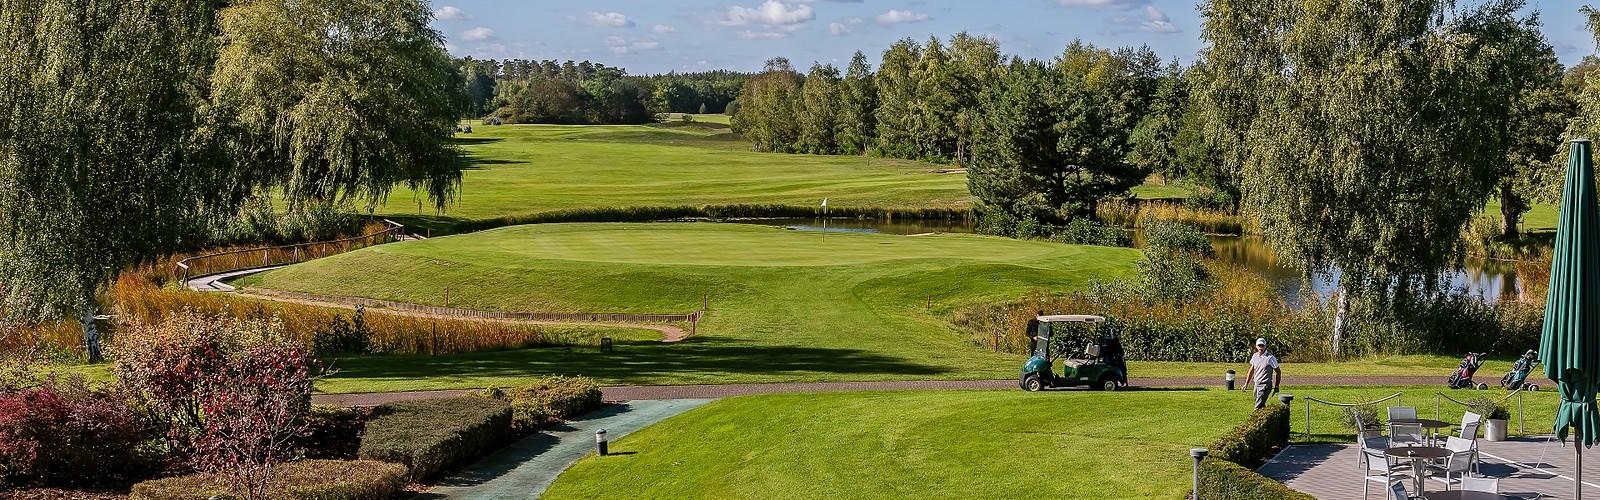 GolfResort Semlin, photo: GolfResort Semlin